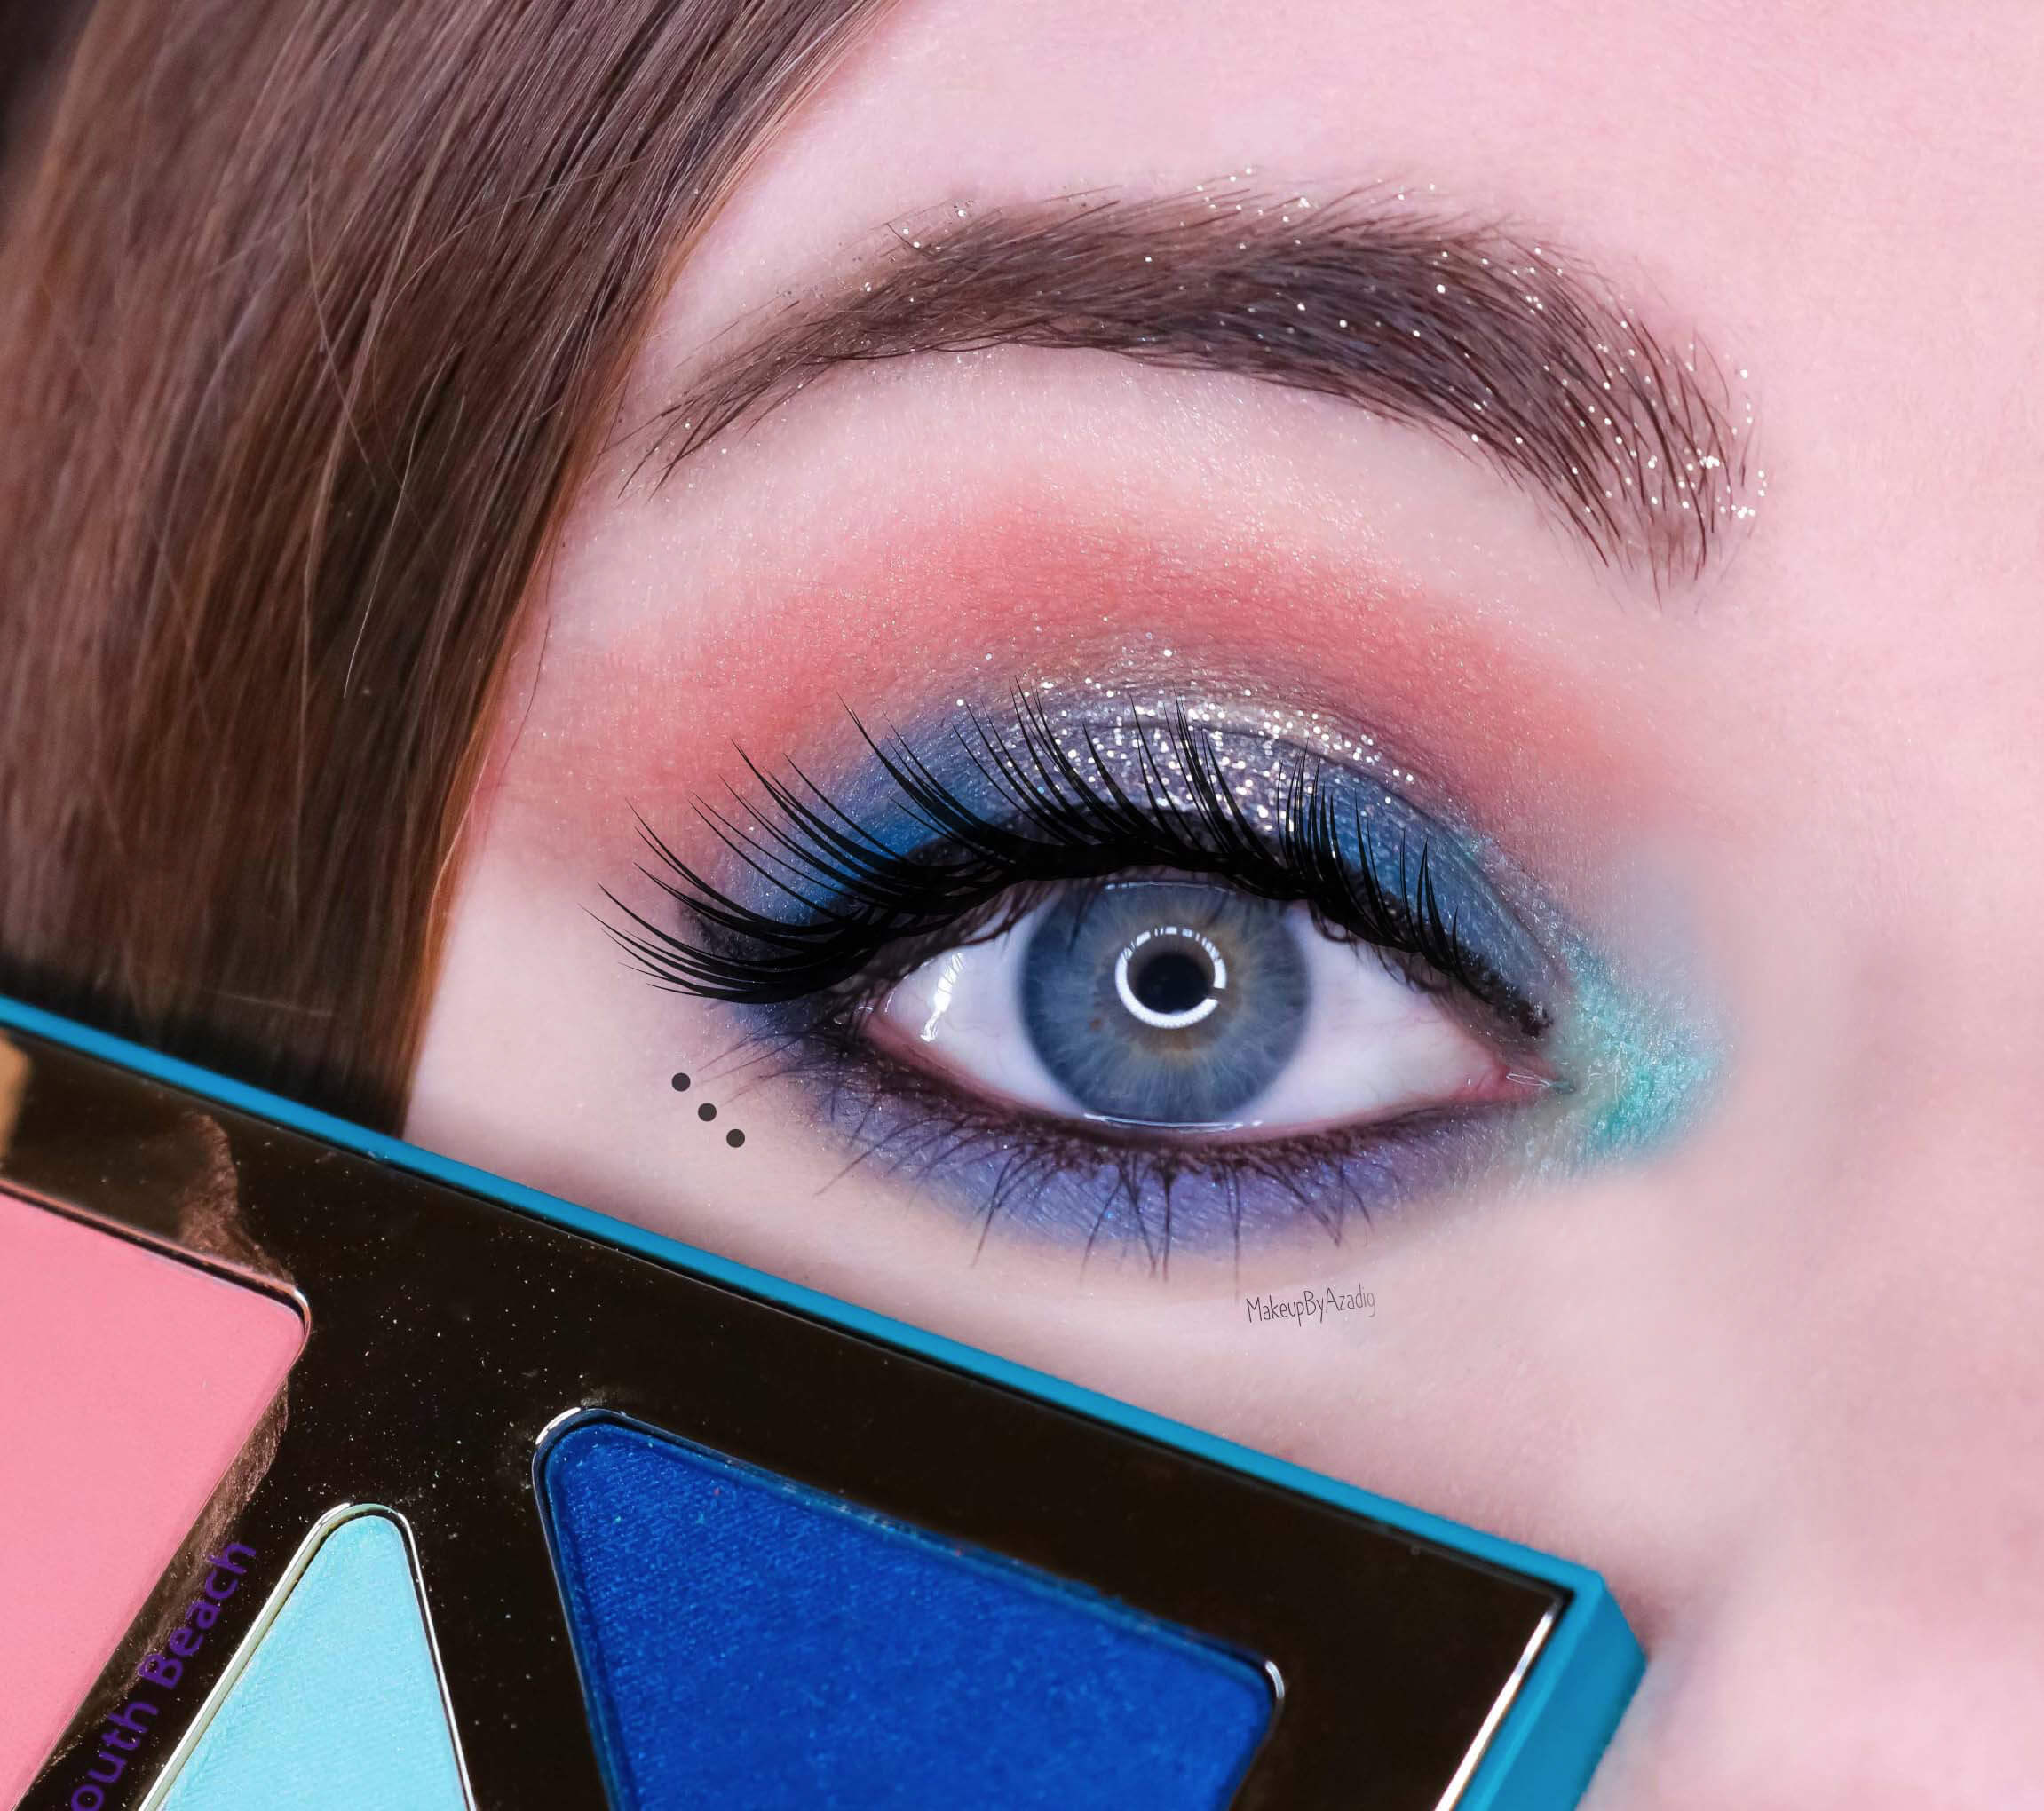 revue-palette-tarte-cosmetics-france-sephora-makeupbyazadig-swatch-prix-avis-rainforest-of-the-sea-tortue-maquillage-makeup